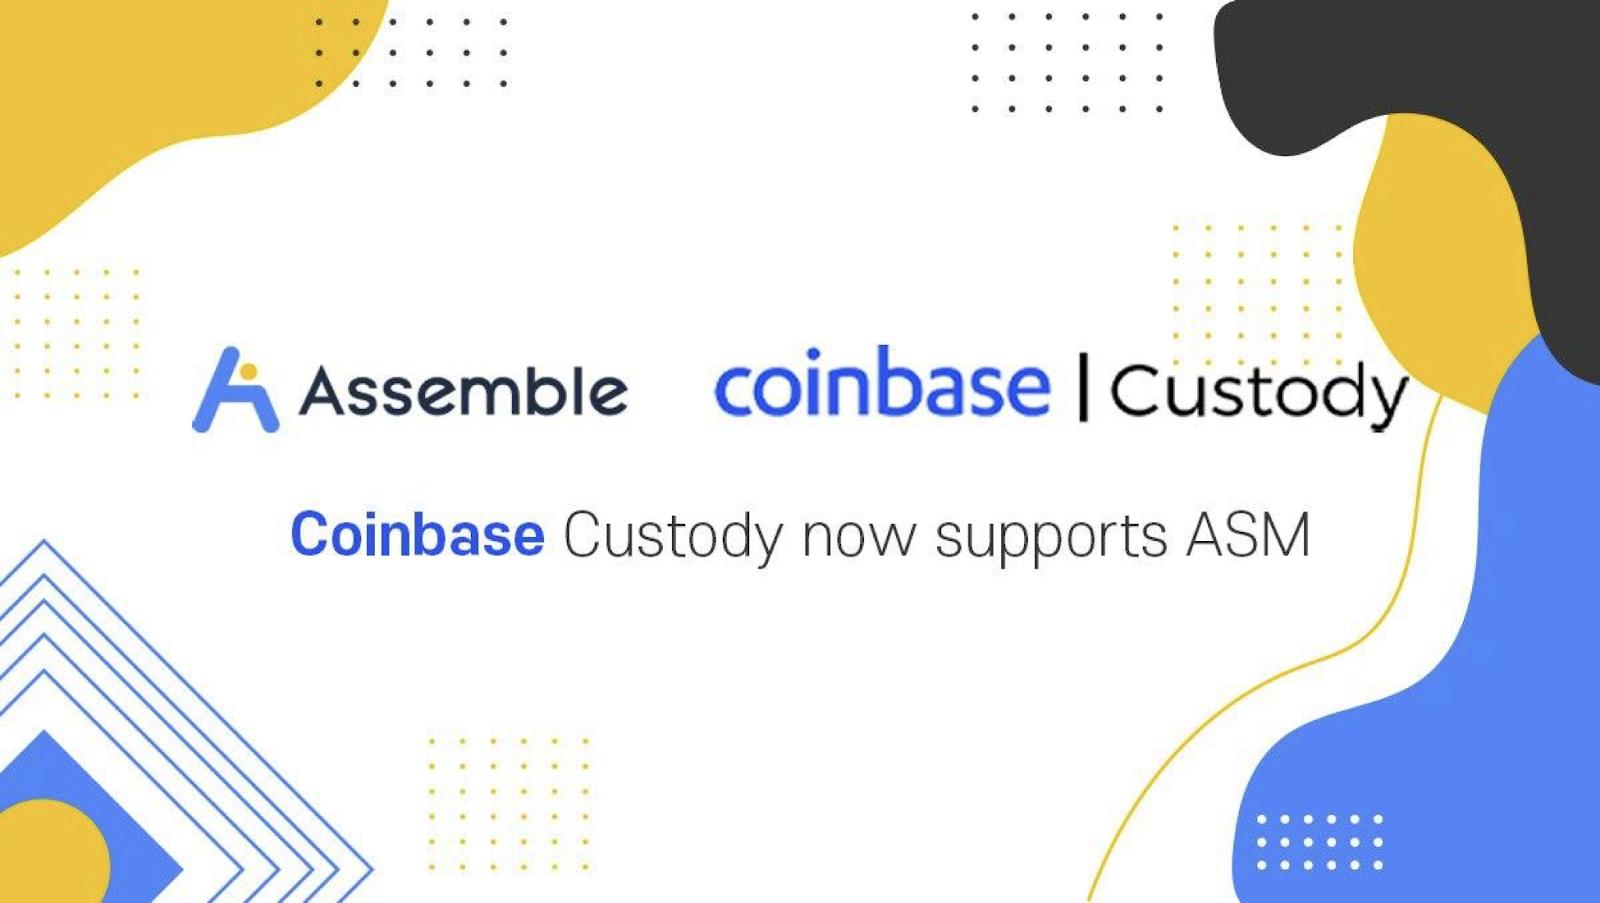 assemble Coinbase